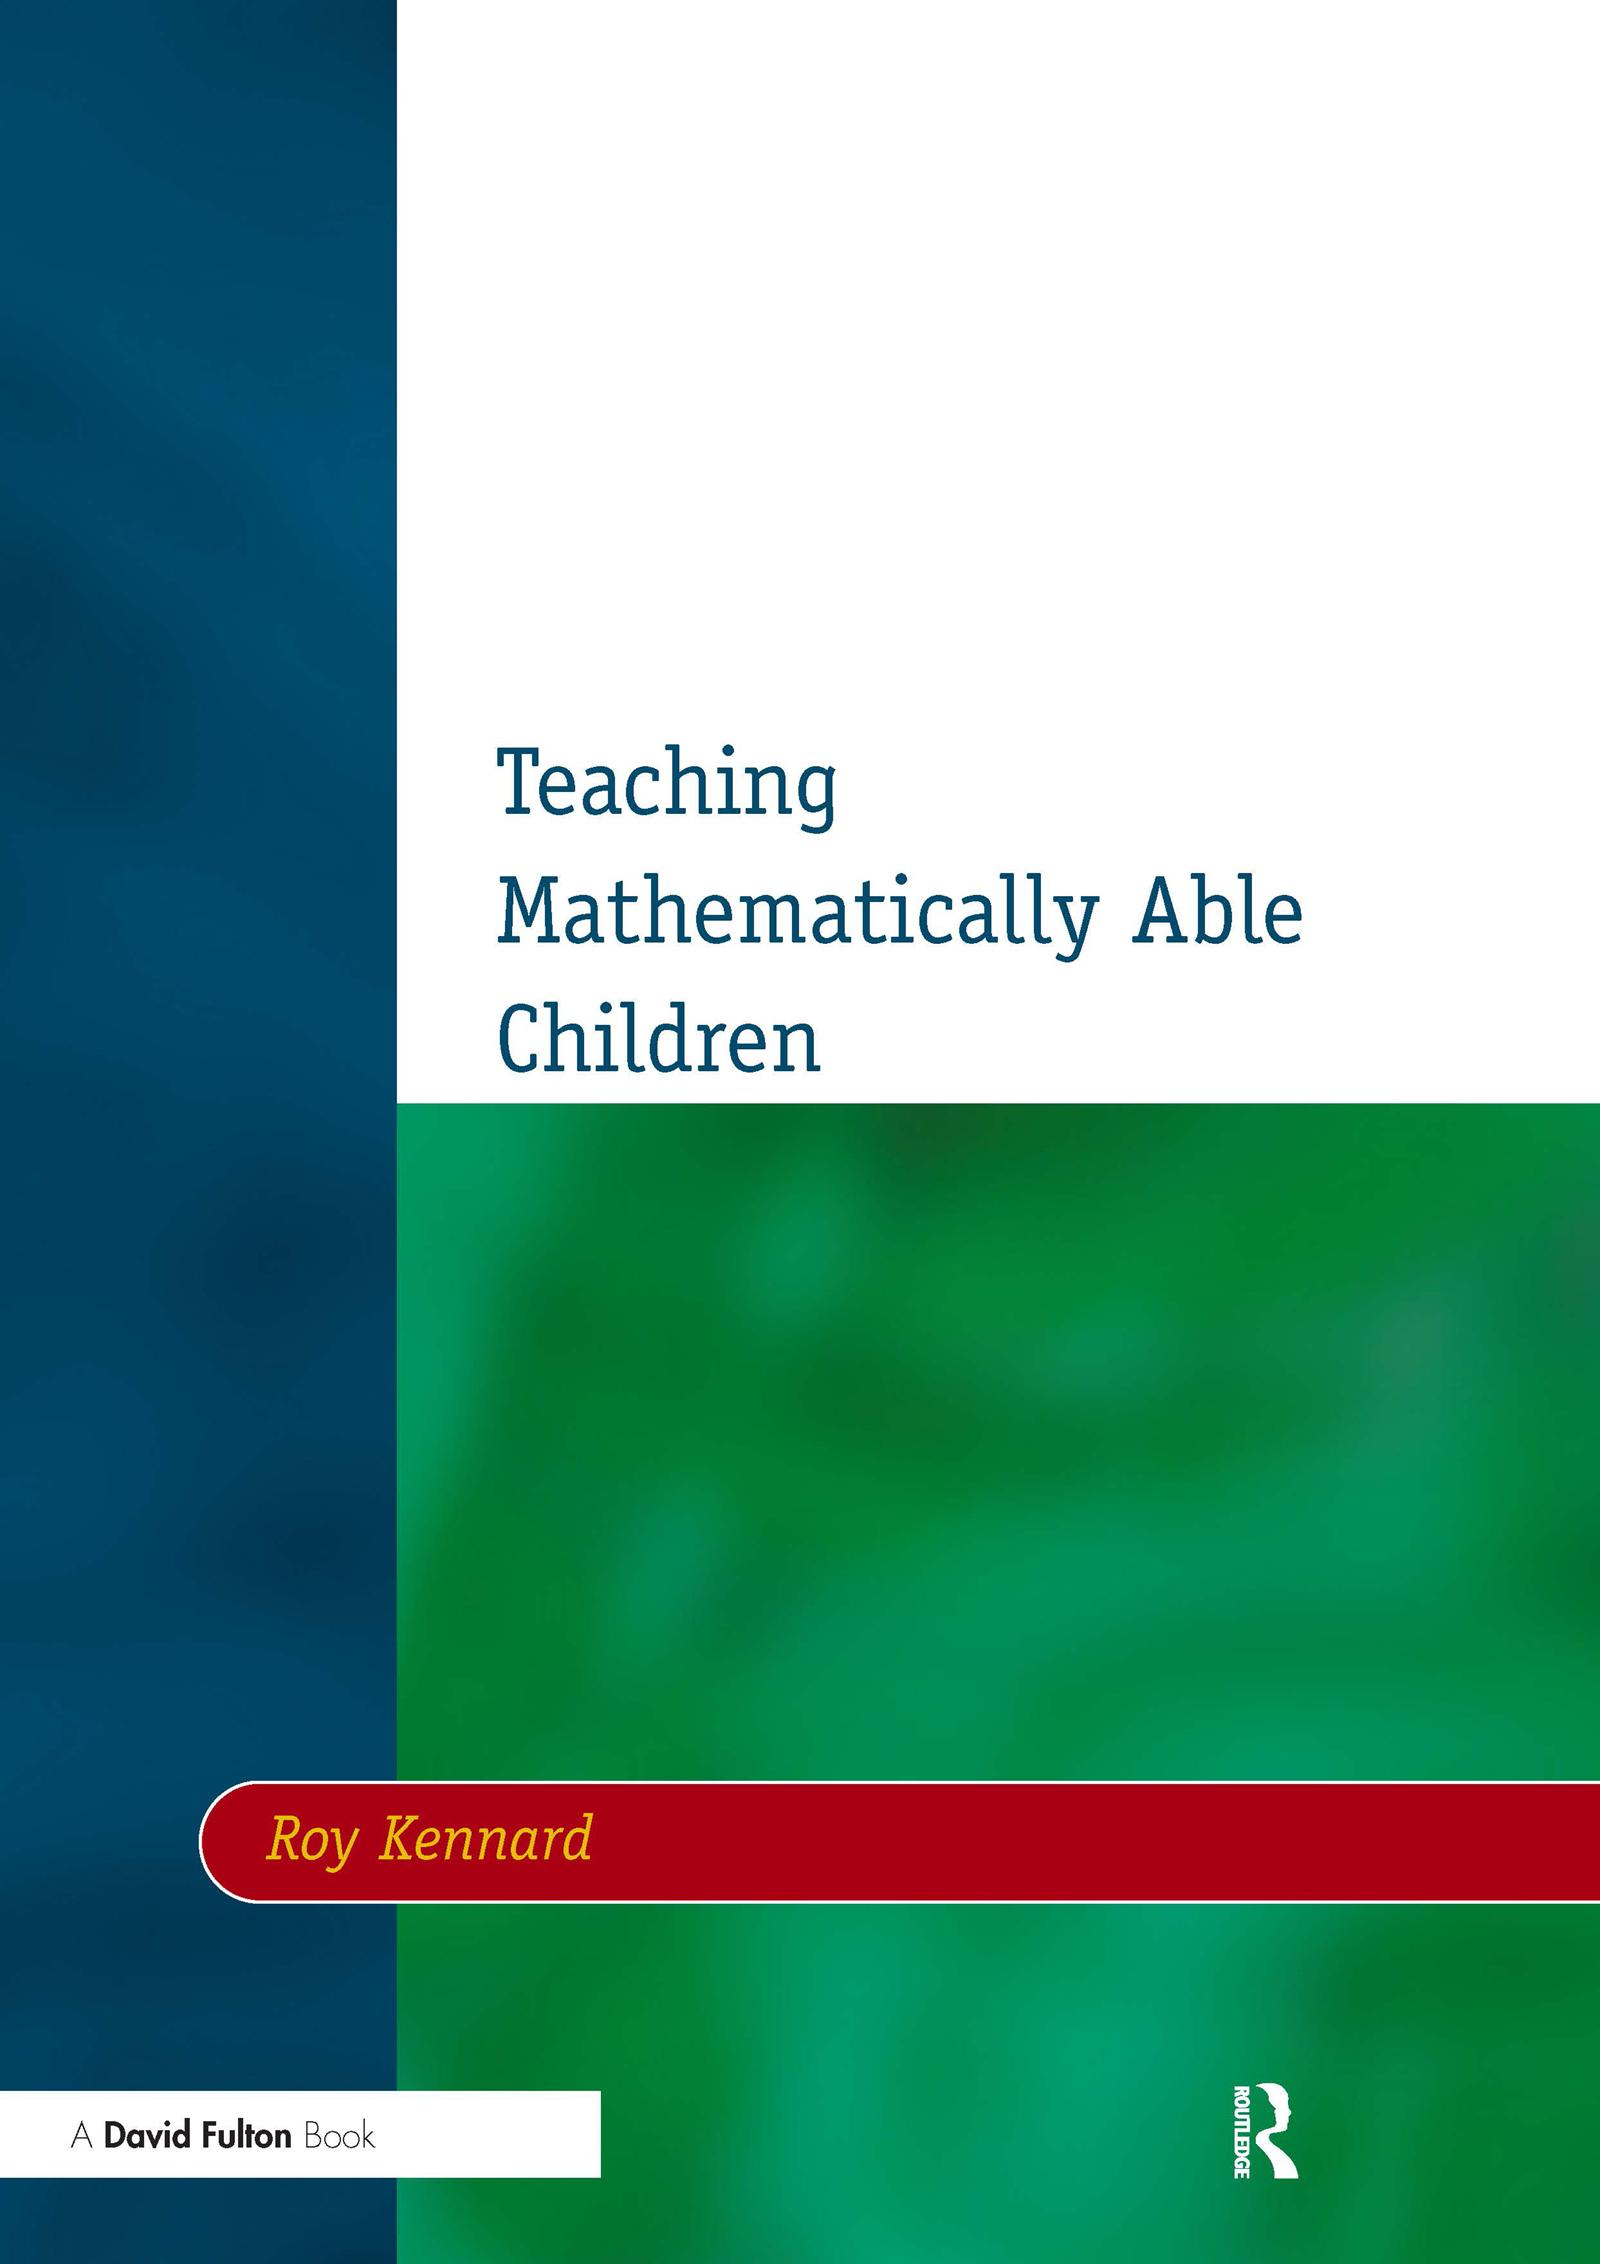 Teaching Mathematically Able Children